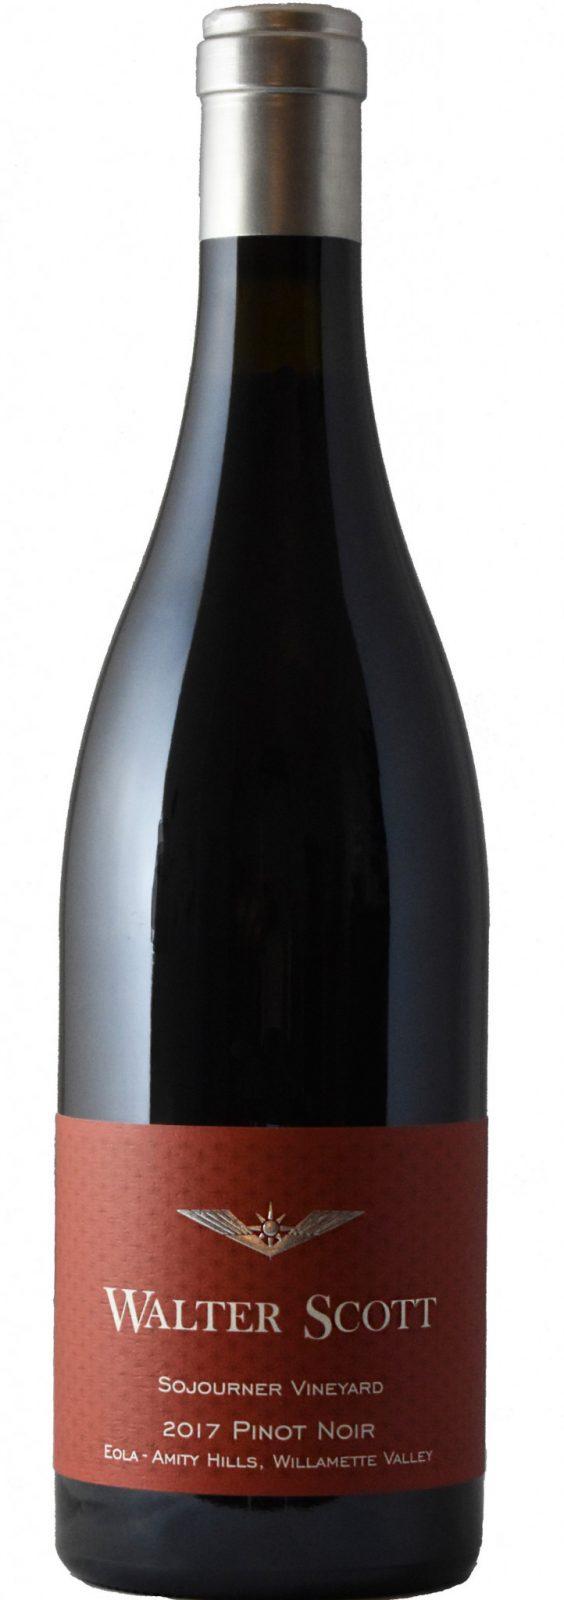 Walter Scott Sojourner Pinot Noir